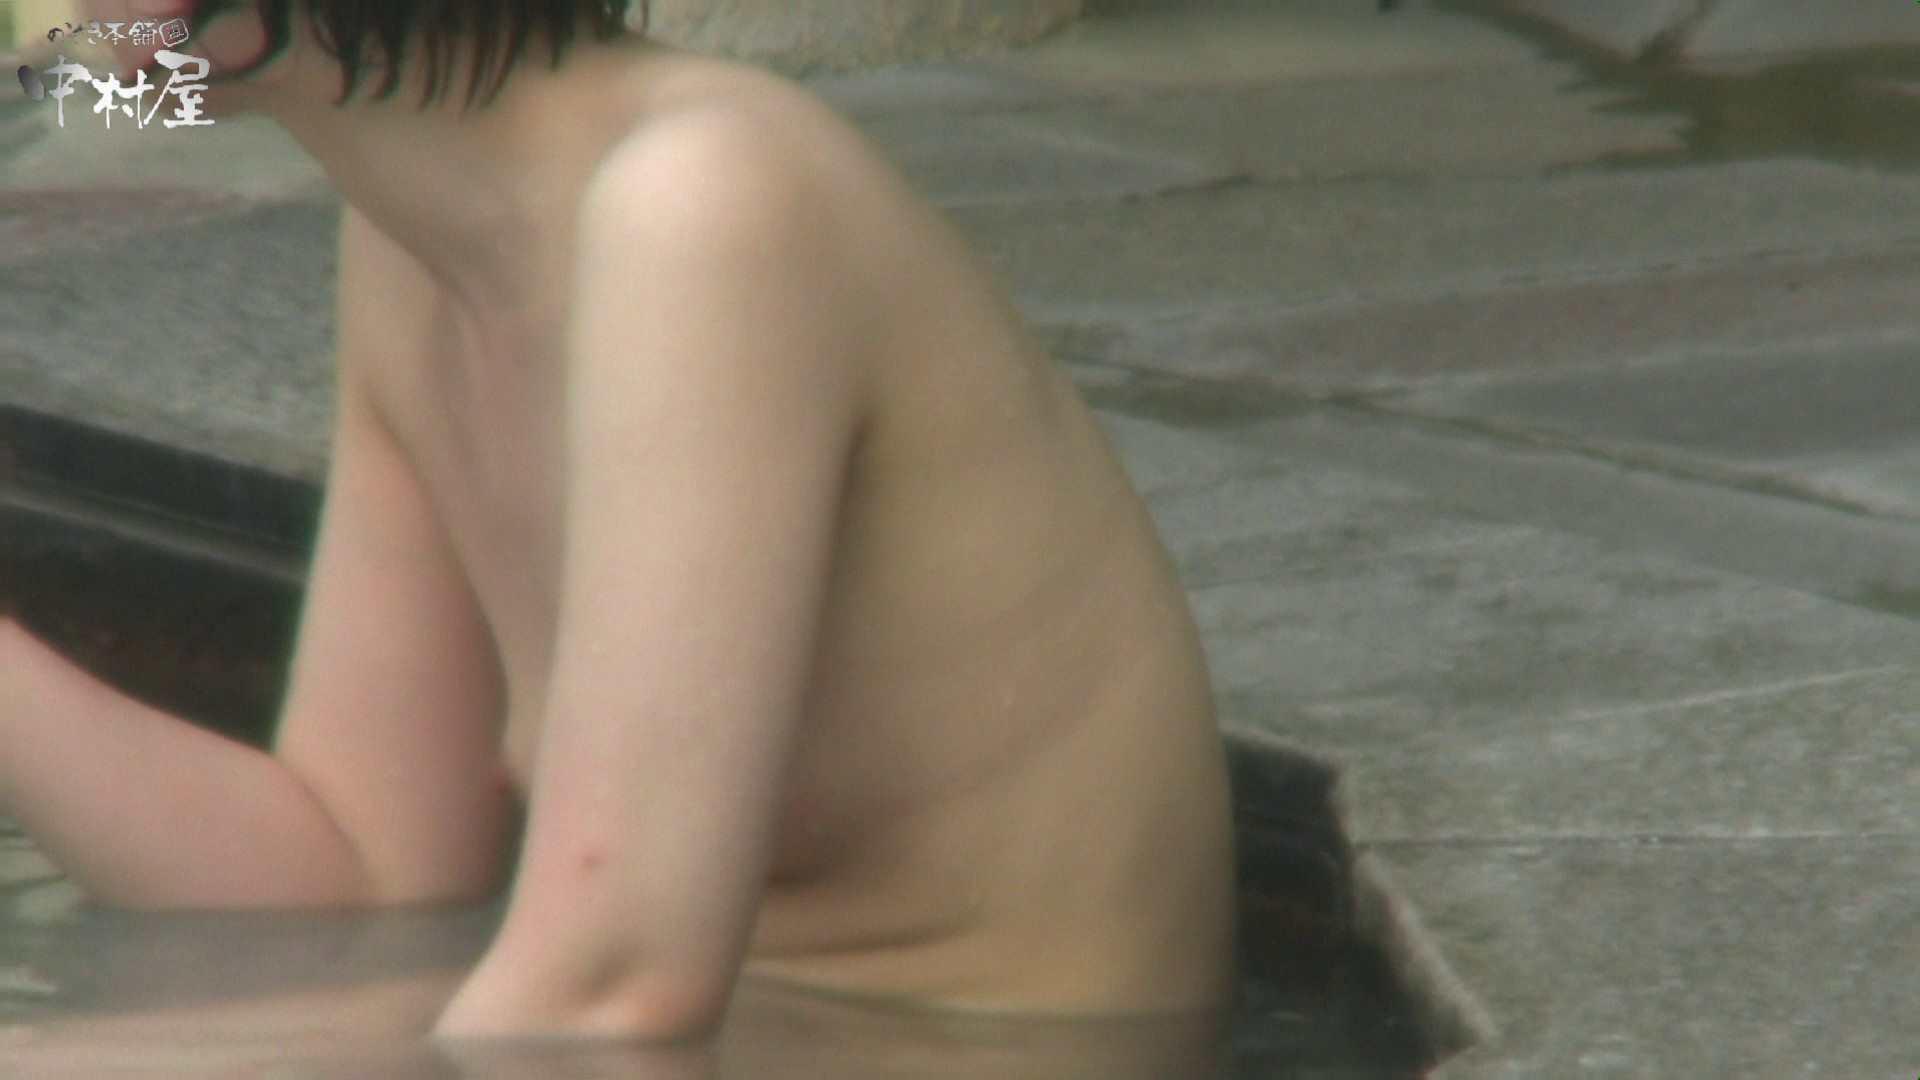 Aquaな露天風呂Vol.945 盗撮師作品  75pic 12